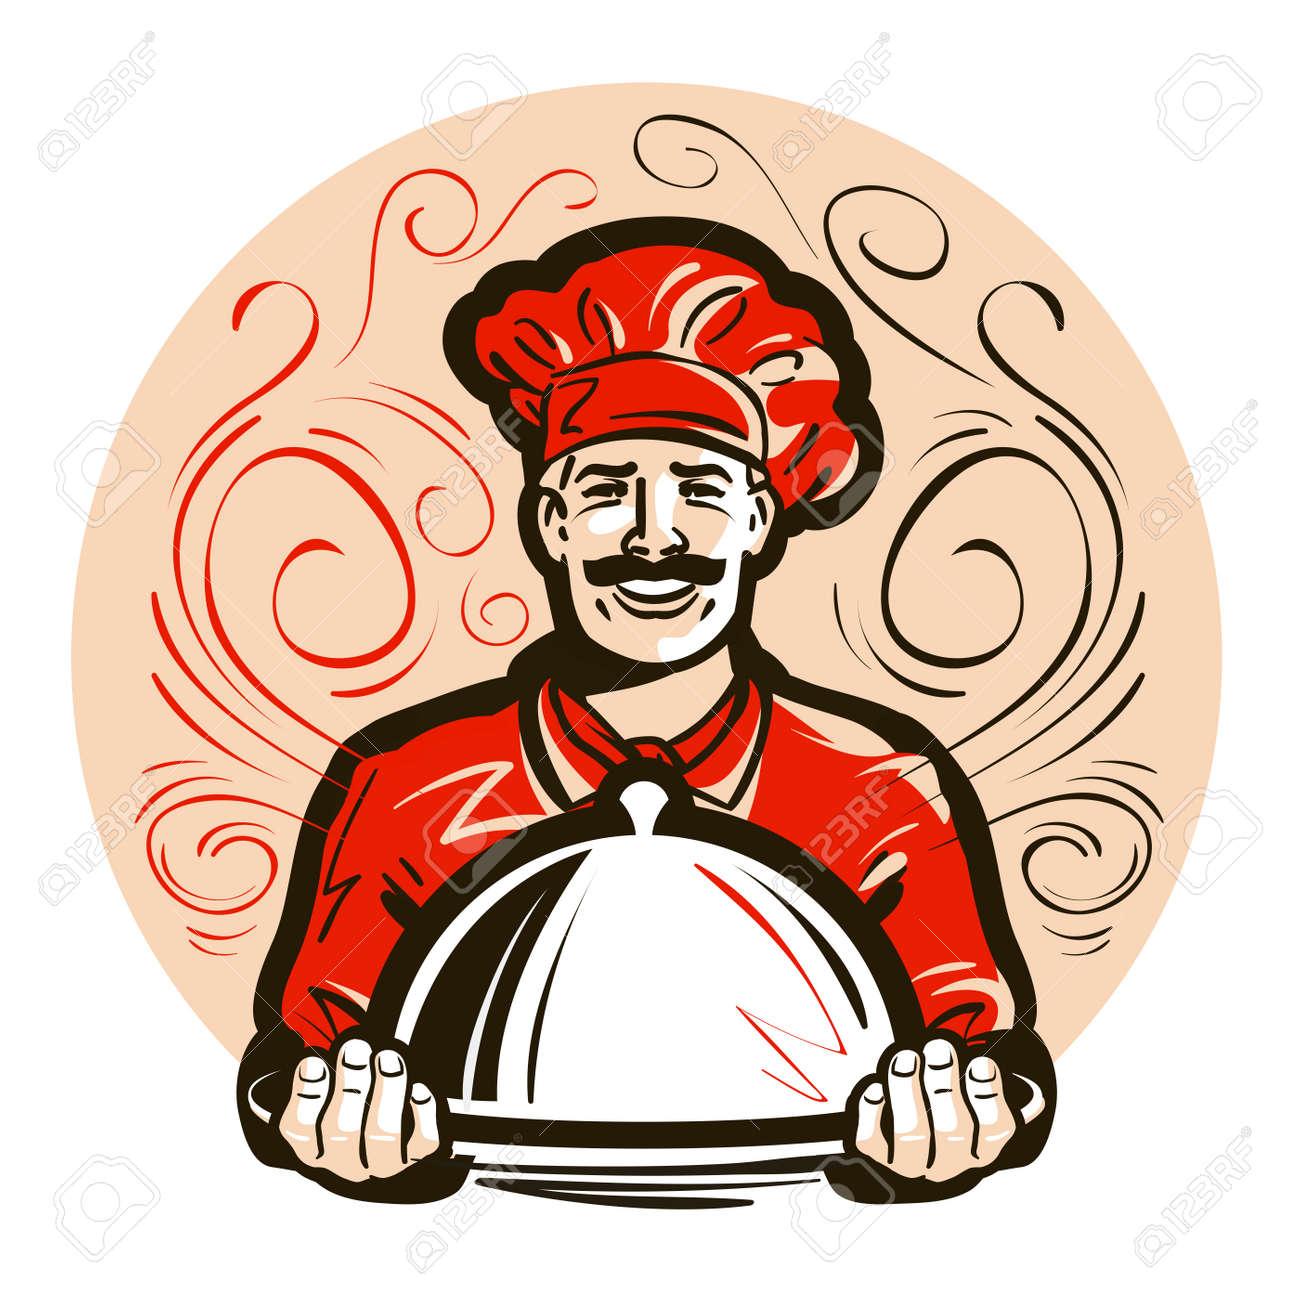 restaurant, cafe vector logo. menu, dish, food or chef icon - 55349018